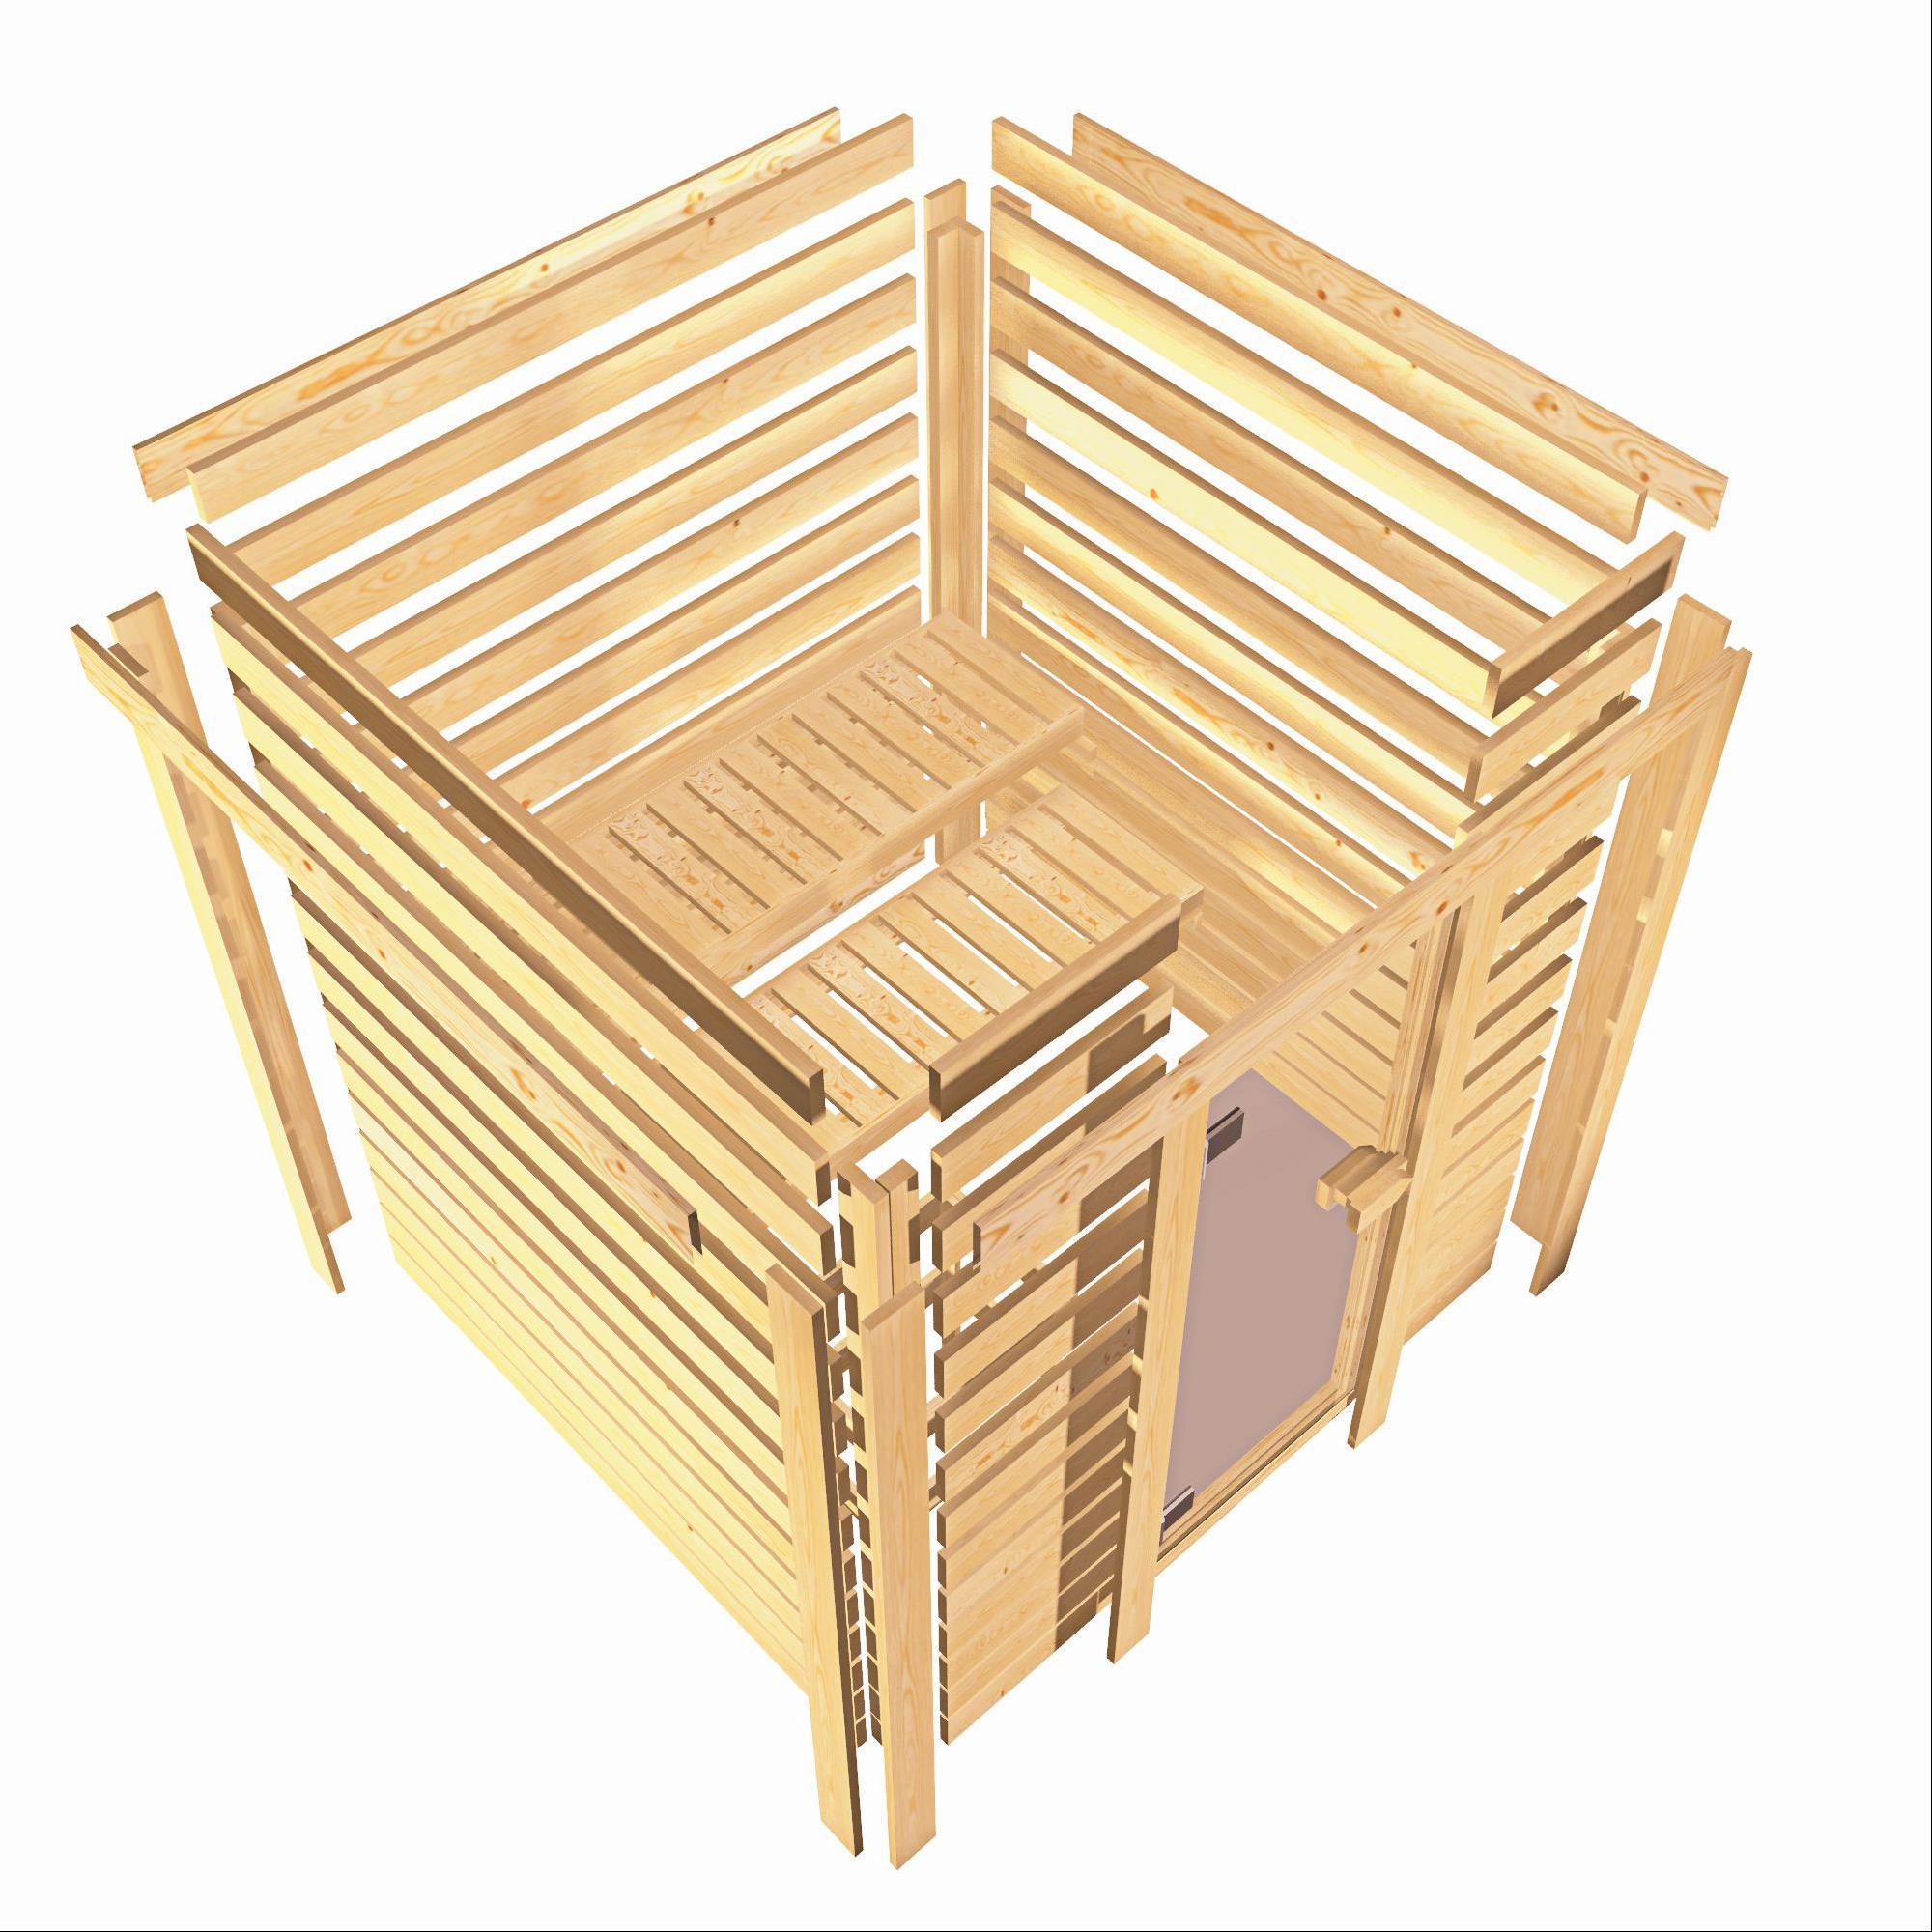 WoodFeeling Sauna Mia 38mm Saunaofen 9kW extern Holztür Bild 4